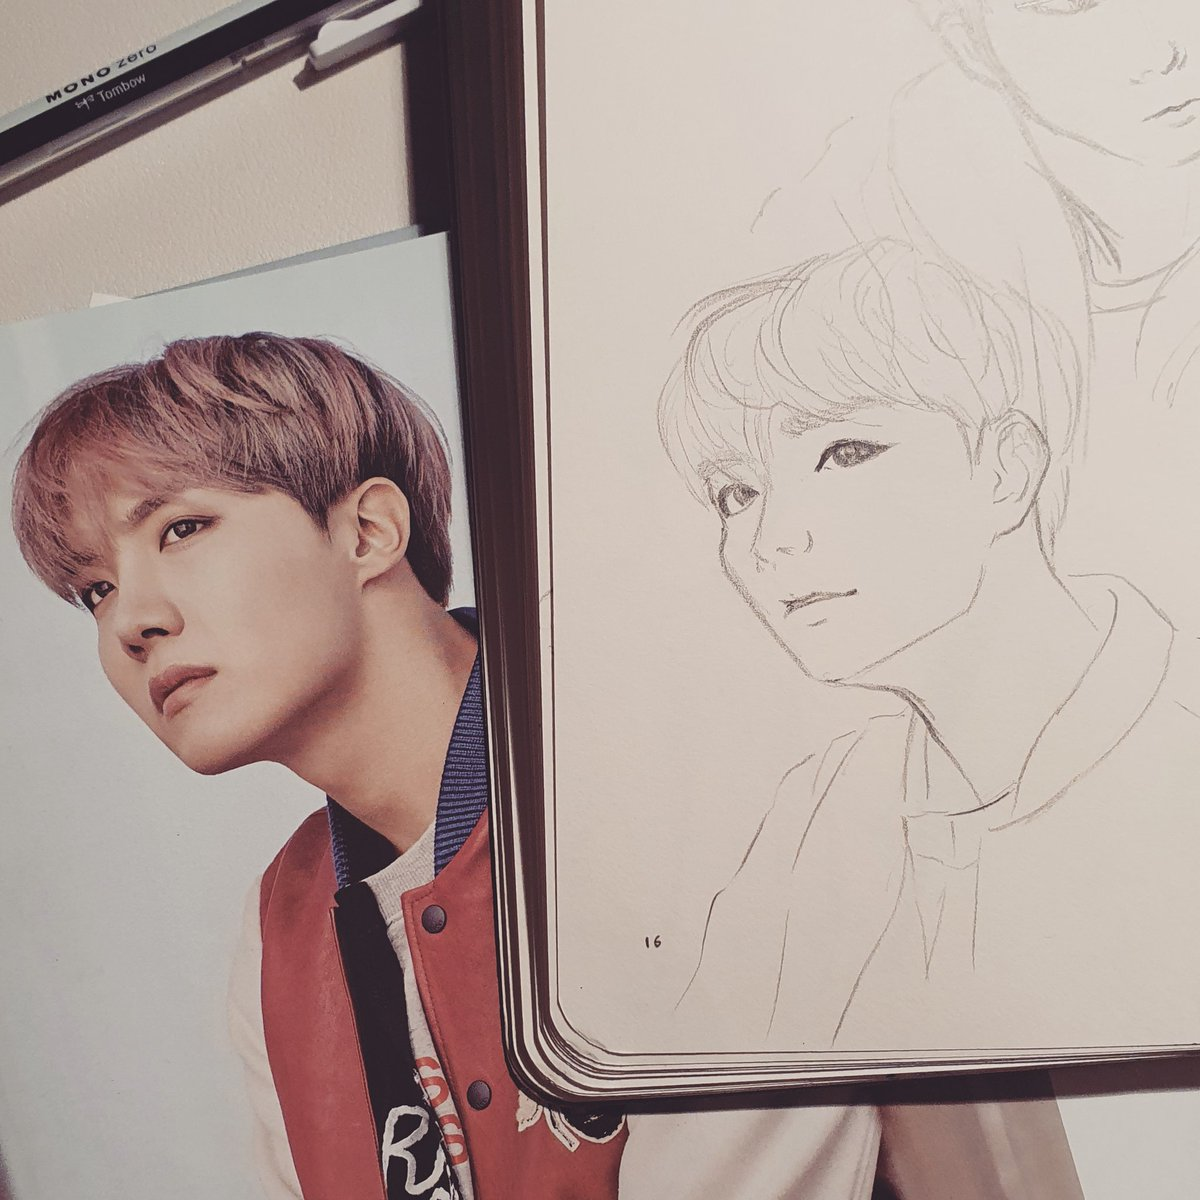 Hobi finally looking good 🥺 😭 💜  #hobi #jhope #hoseok #junghoseok #portrait #bts #bangtansonyeondan #btsfanart #sketch #sketchbook #drawing #art #bangtan #onebangtanaday #baguettesarmysxart #youneverwalkalone #ynwa